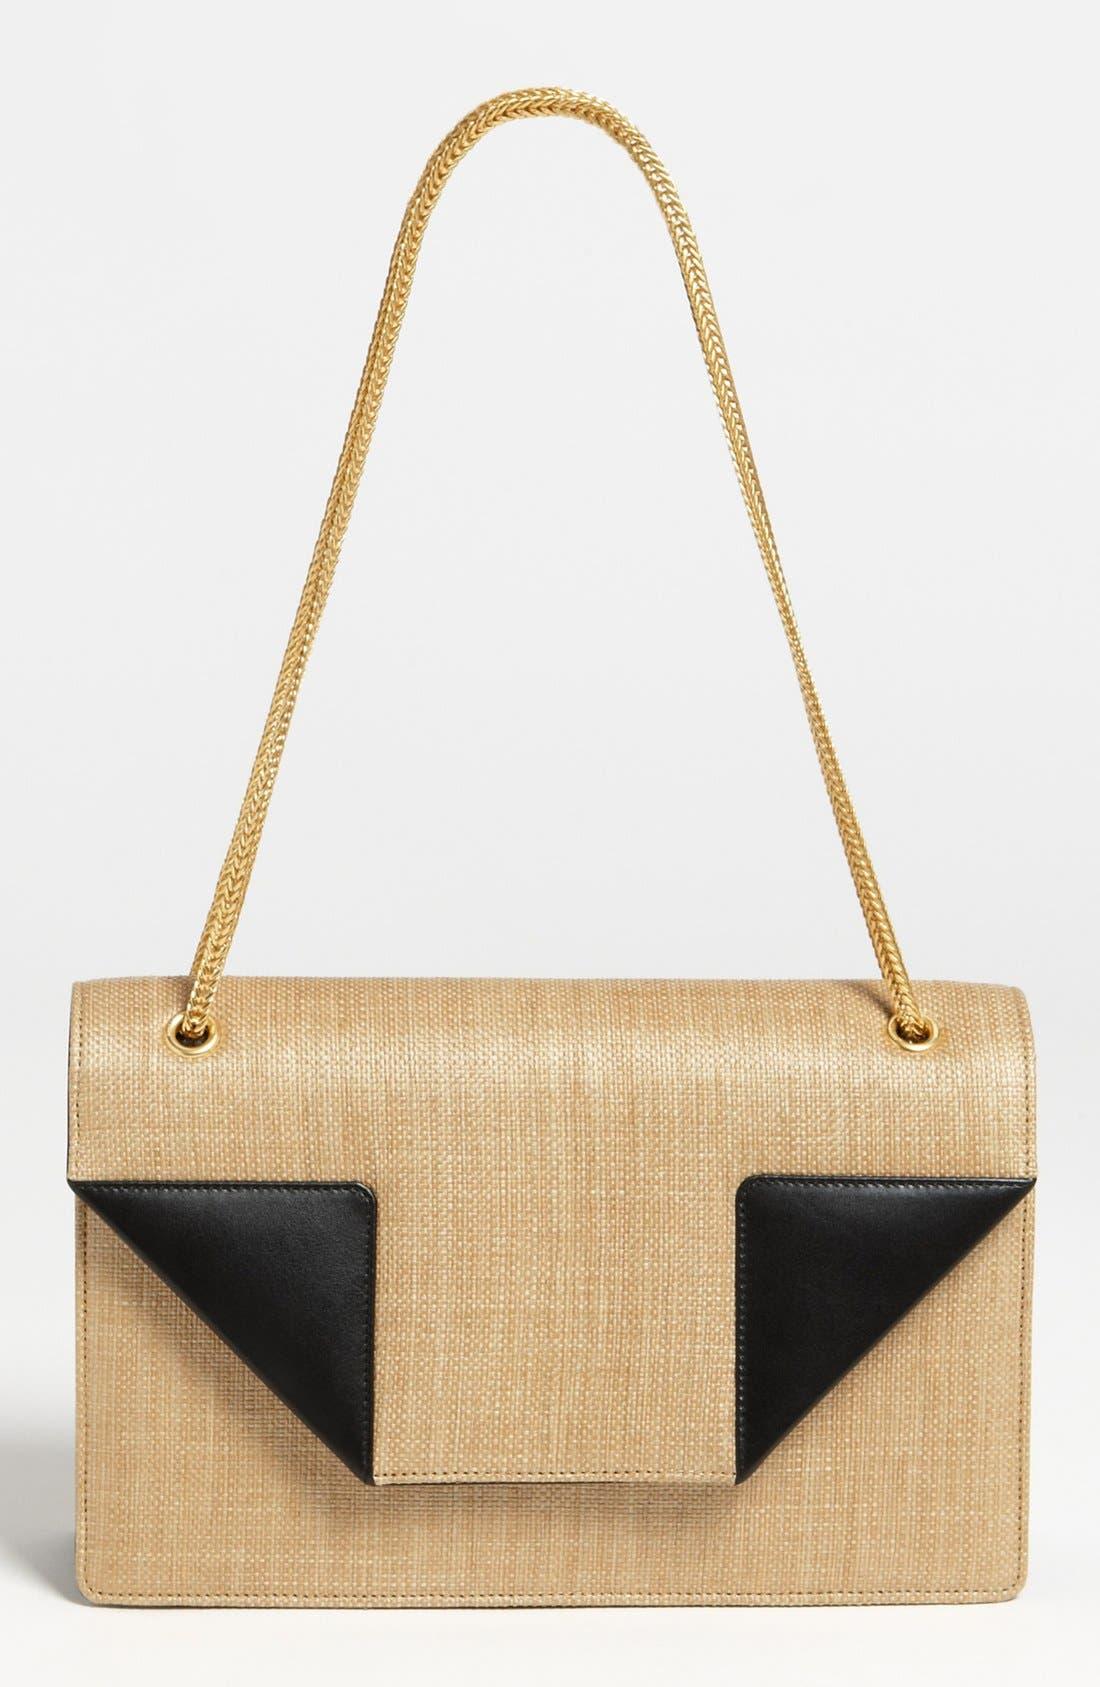 Alternate Image 1 Selected - Saint Laurent 'Betty - Medium' Shoulder Bag